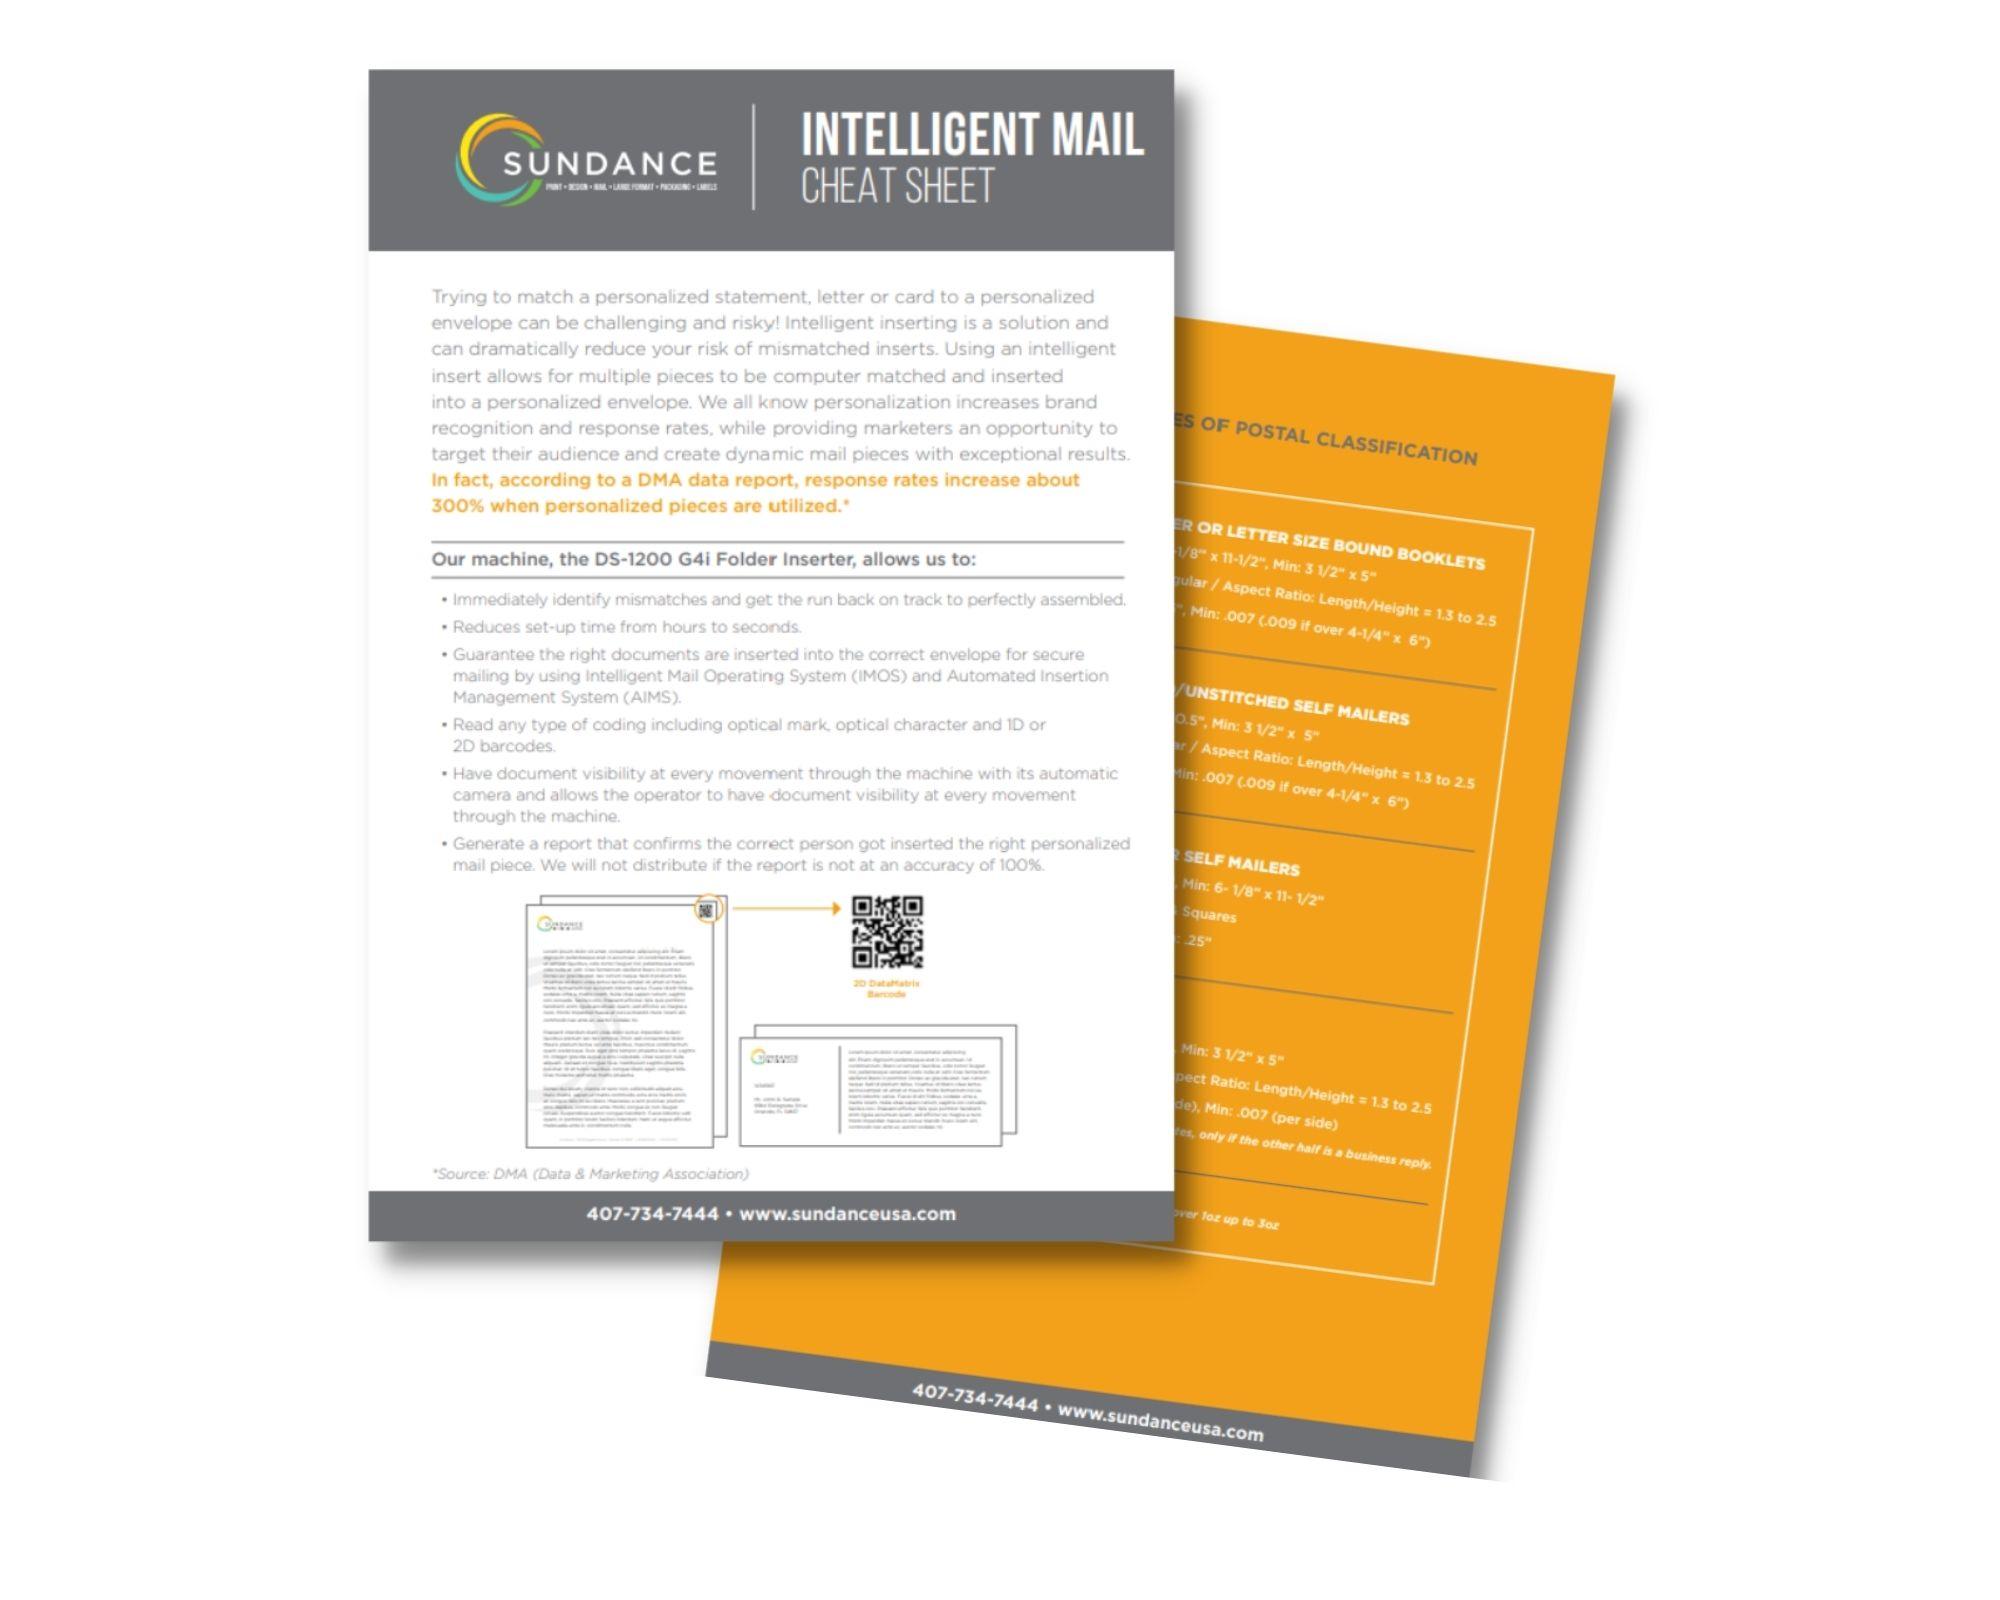 Intelligent Mail Cheat Sheet